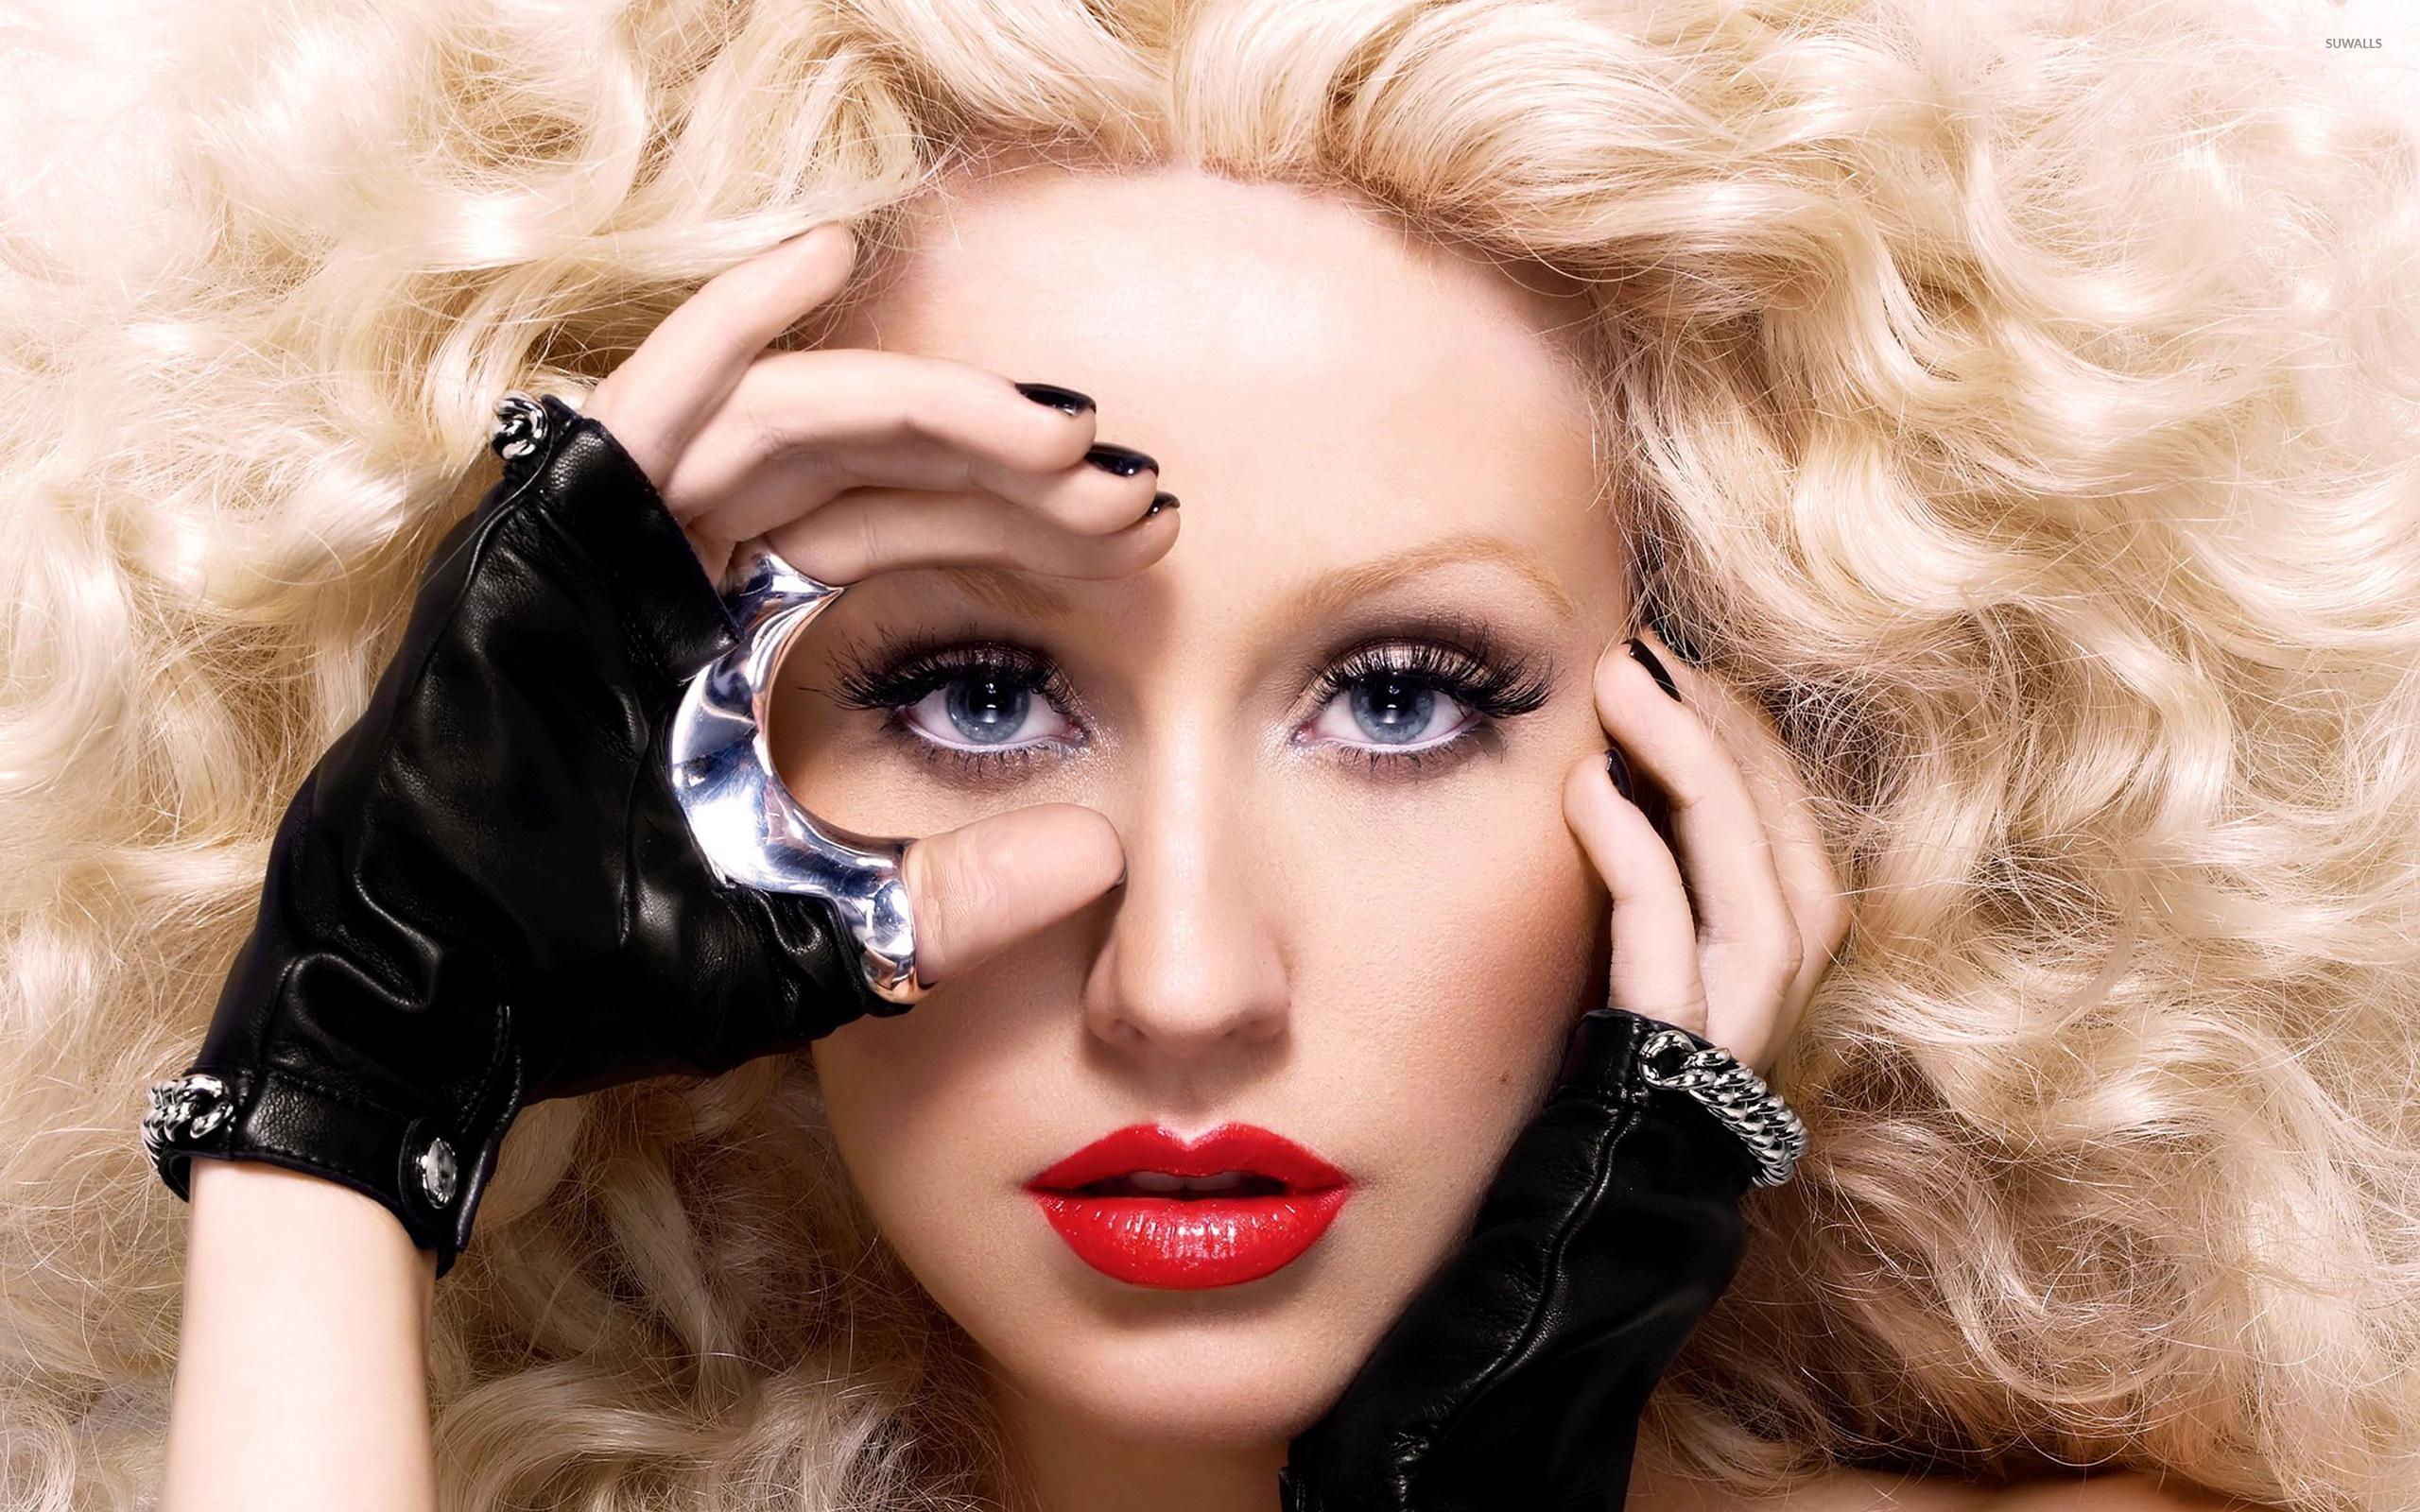 Christina Aguilera Wallpaper 3   2560 X 1600 stmednet 2560x1600